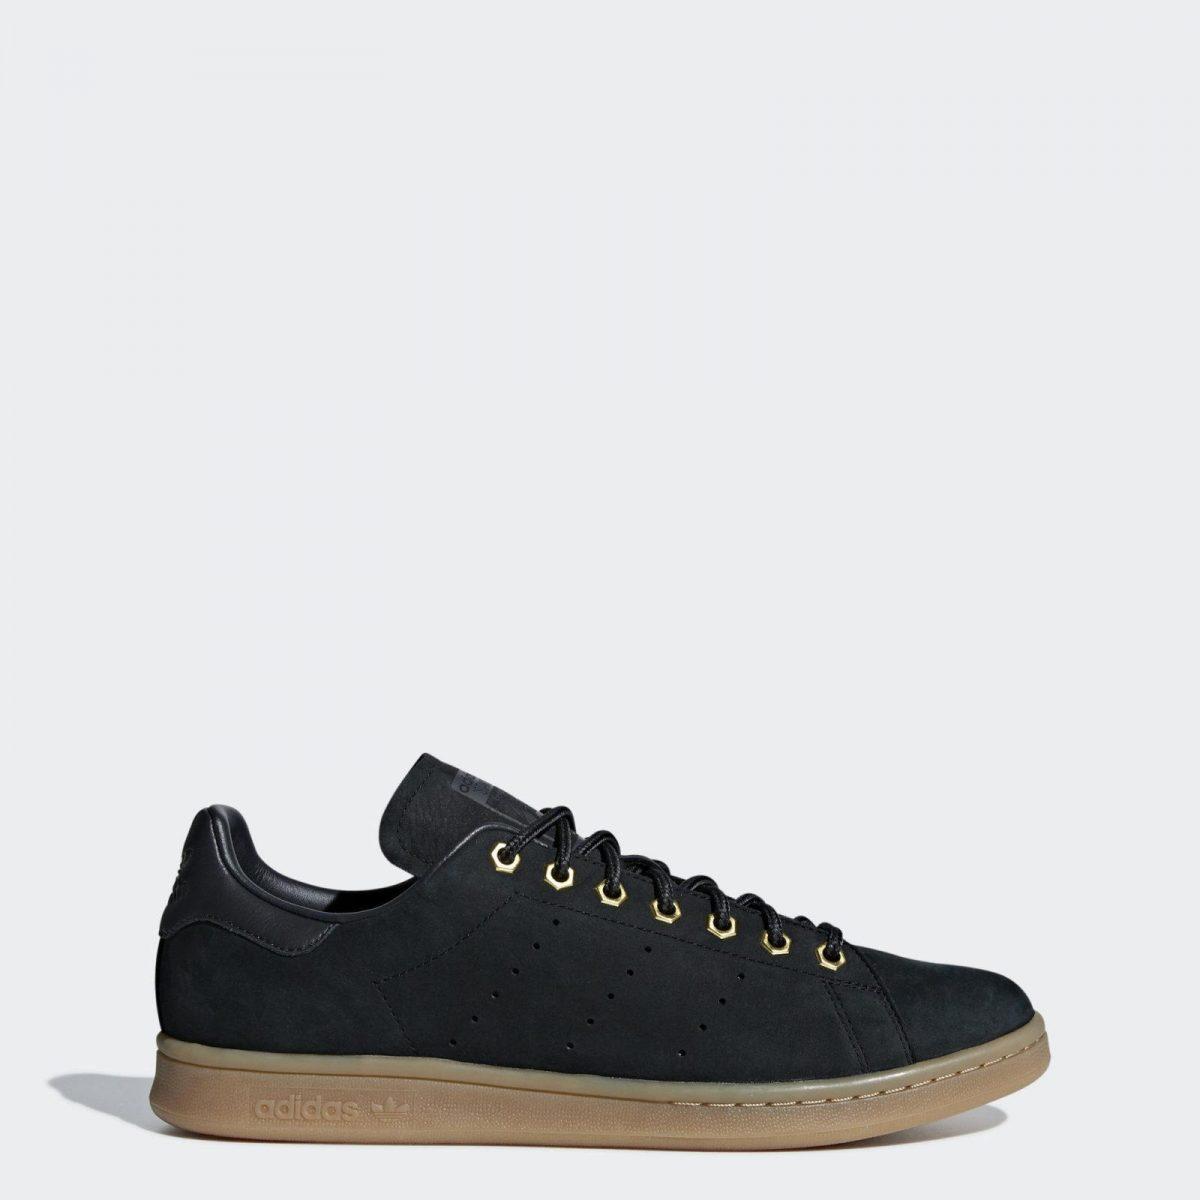 Stan Smith WP adidas Originals (B37872